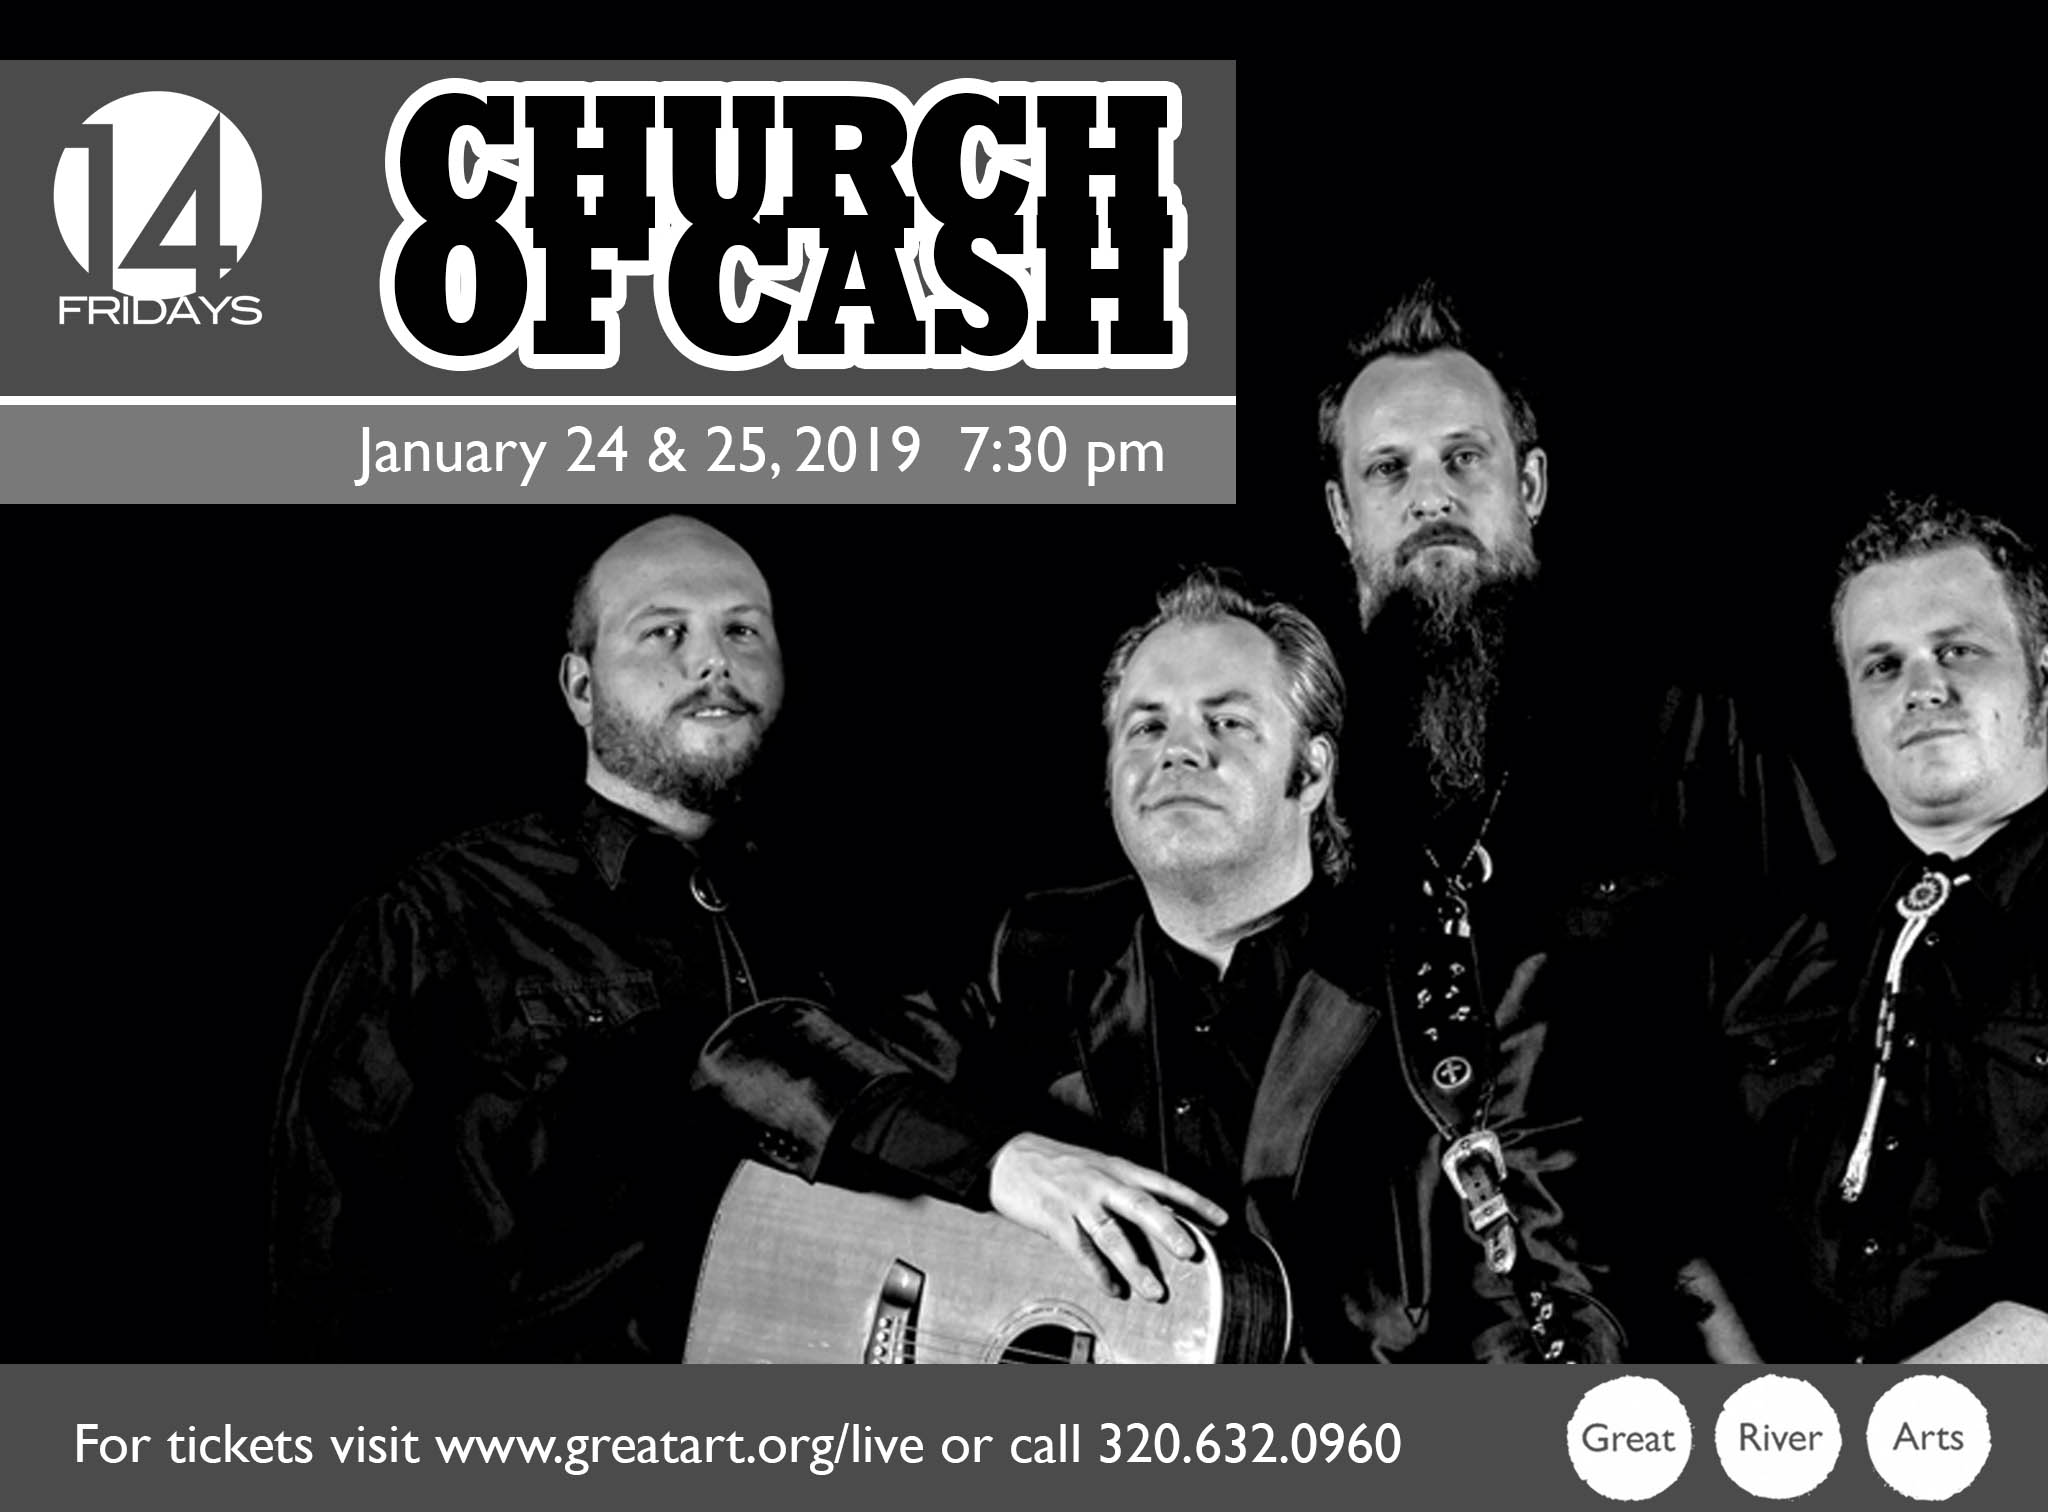 ChurchCash-ExMN-Banner.jpg